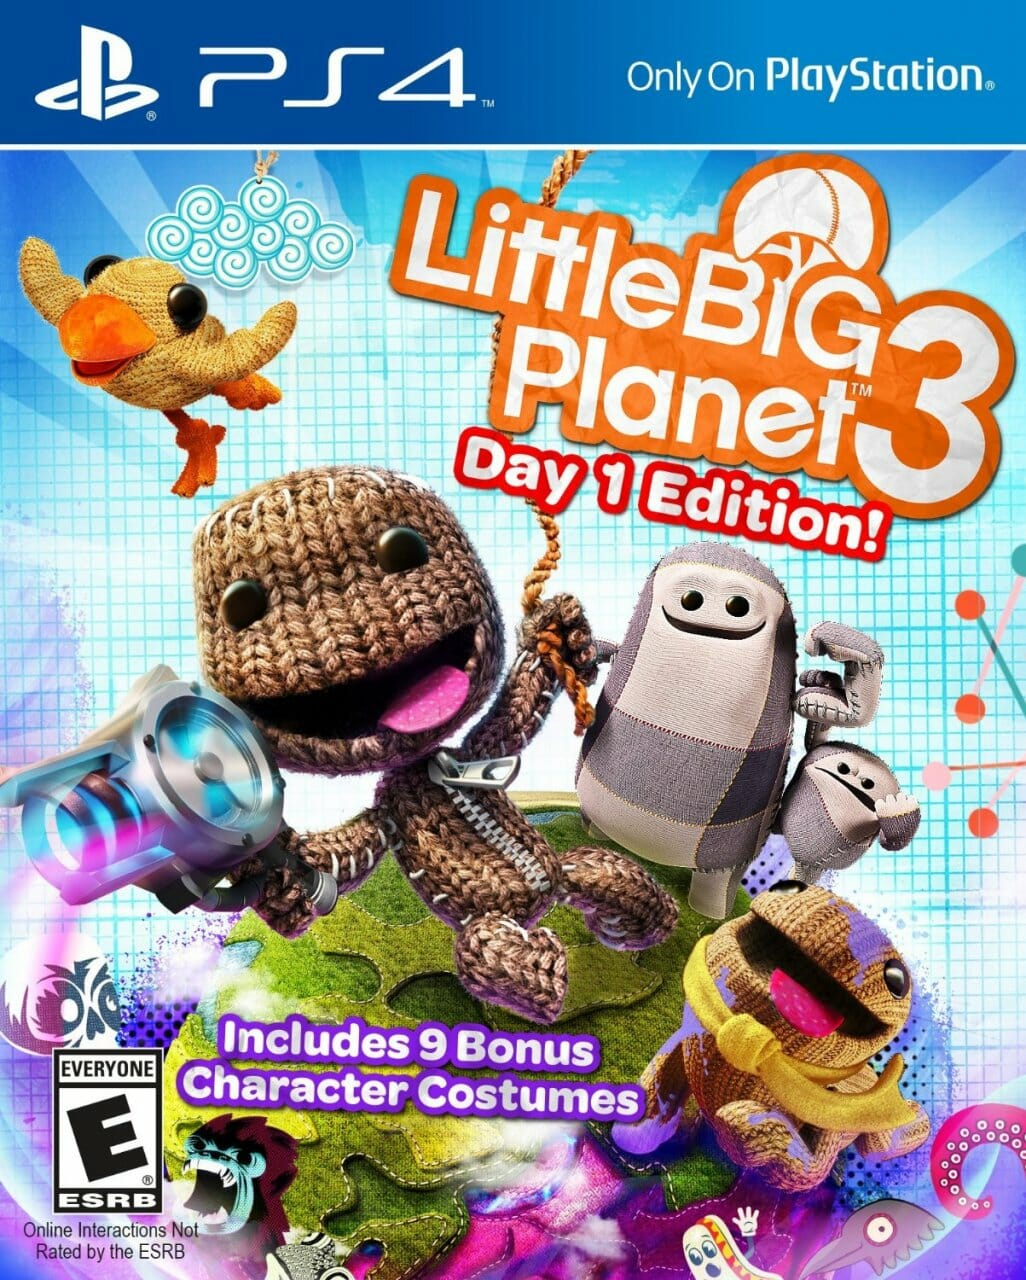 LittleBigPlanet 3 (PS4) Review 3